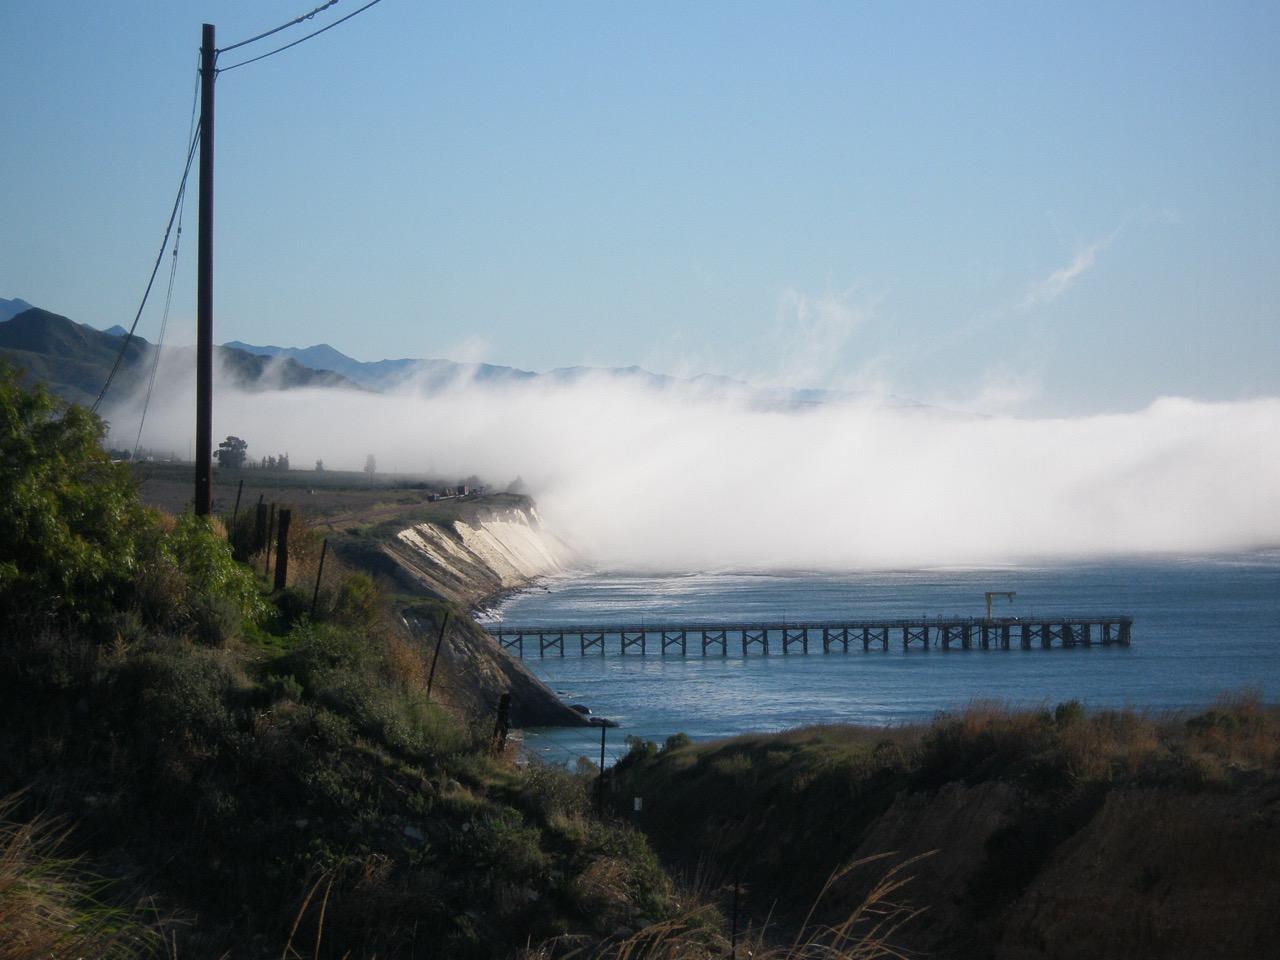 Fog at Gaviota Pier